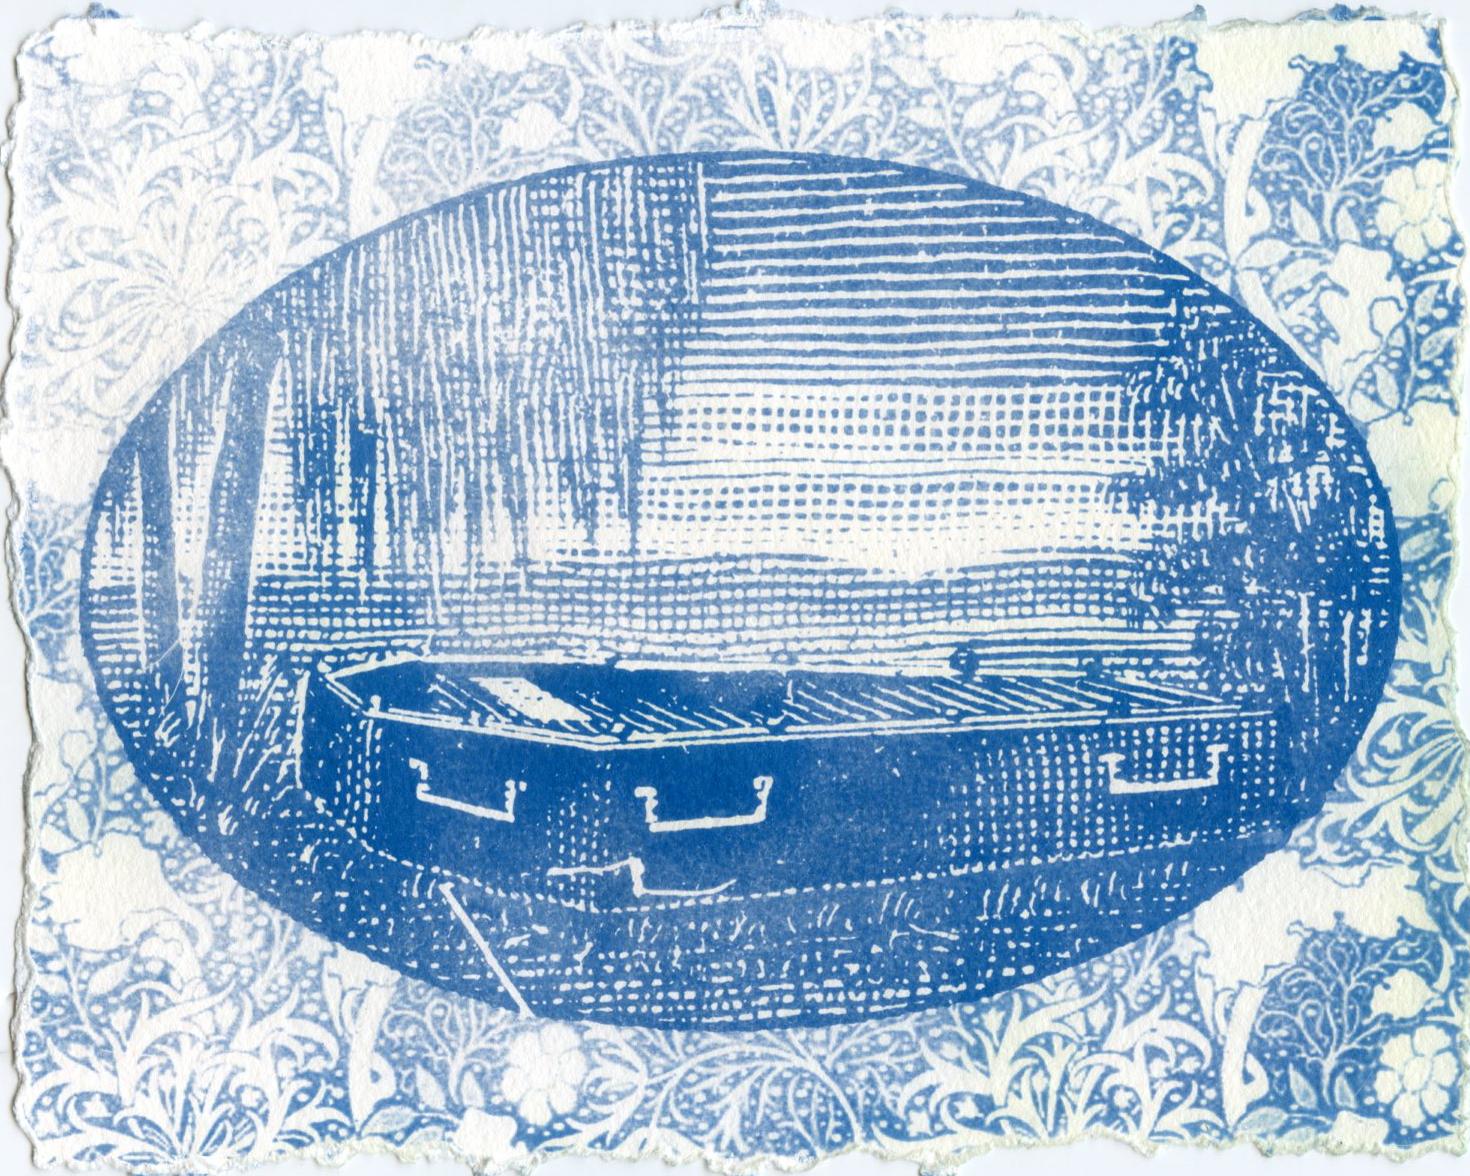 cyanotypes-009.jpg